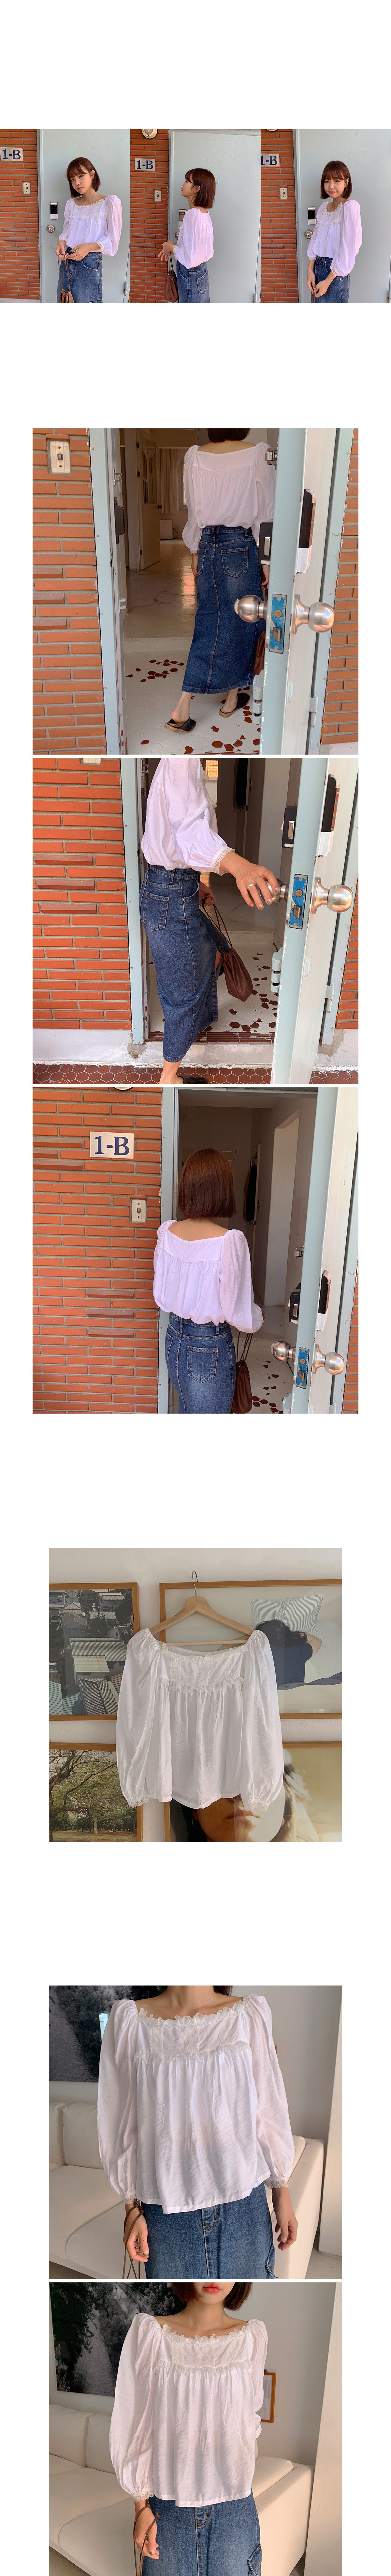 Silk ring blouse